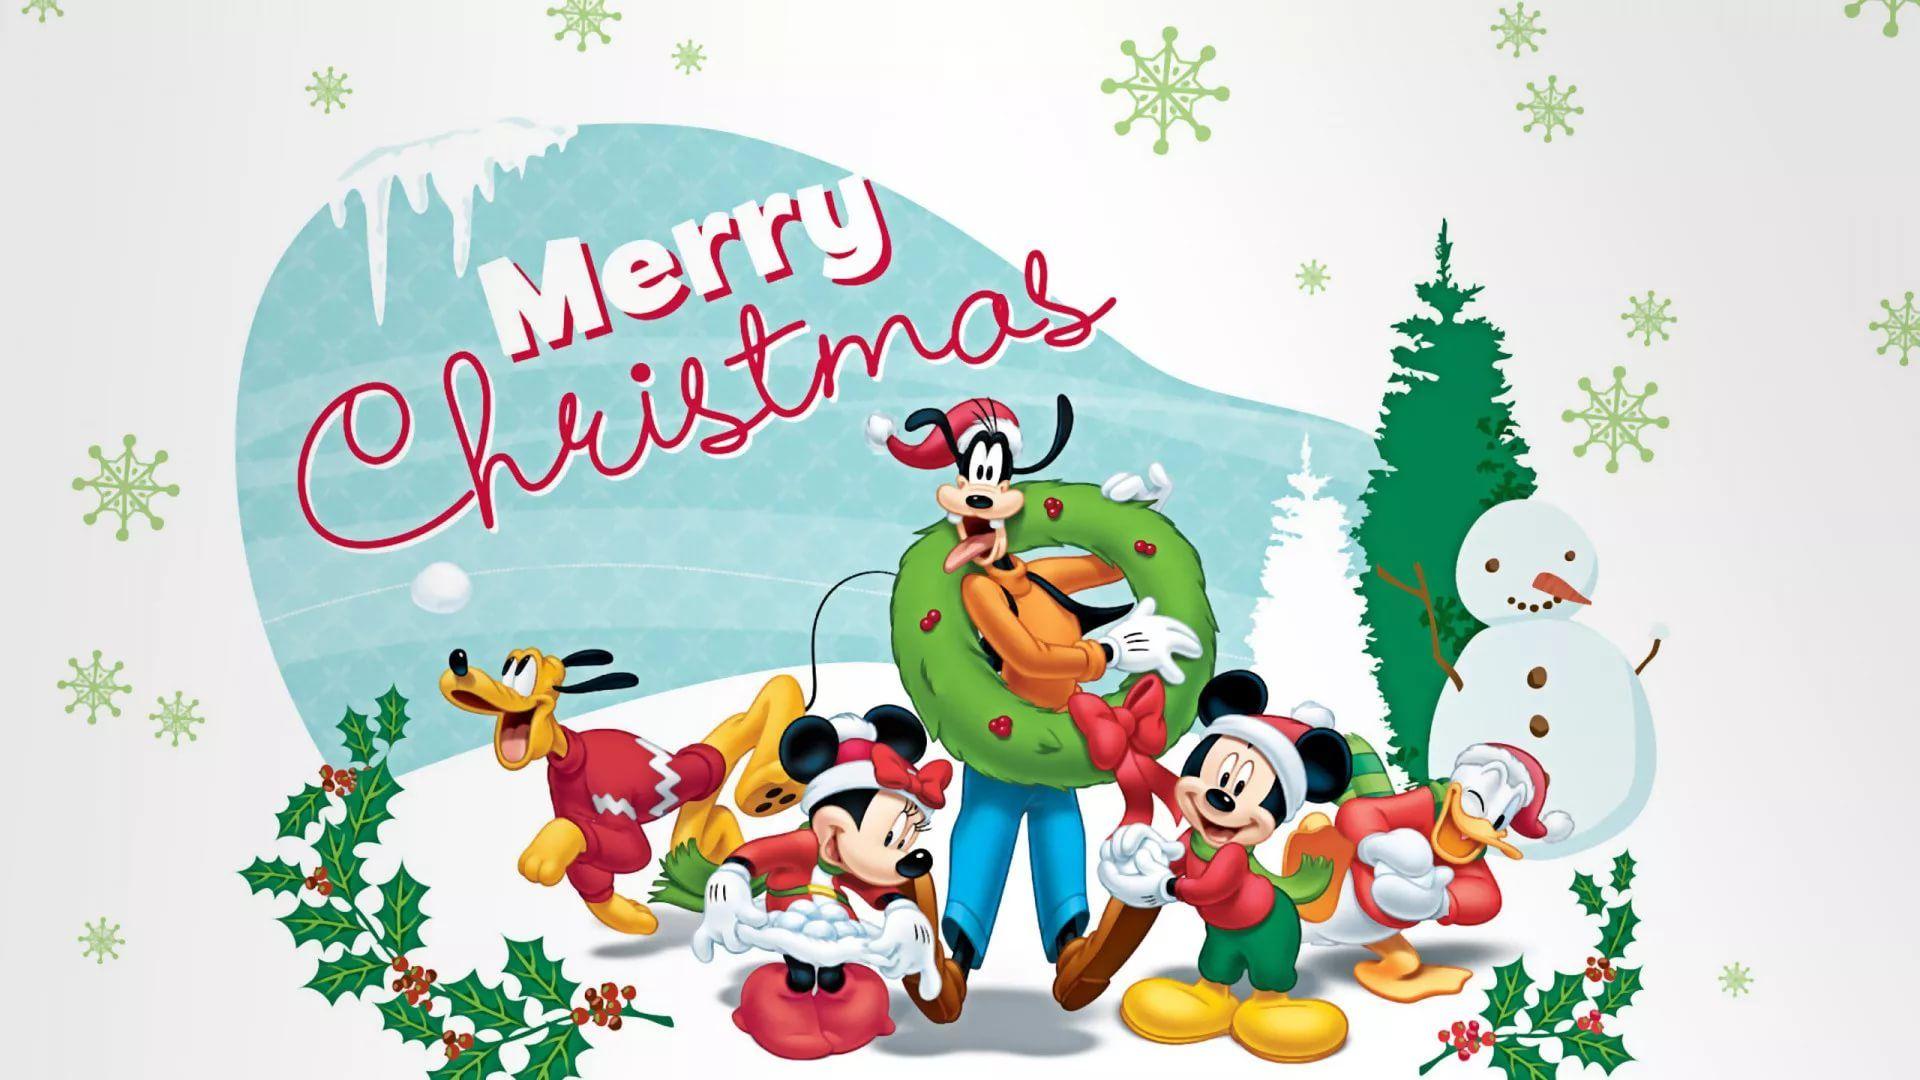 Disney Christmas Cool Wallpaper